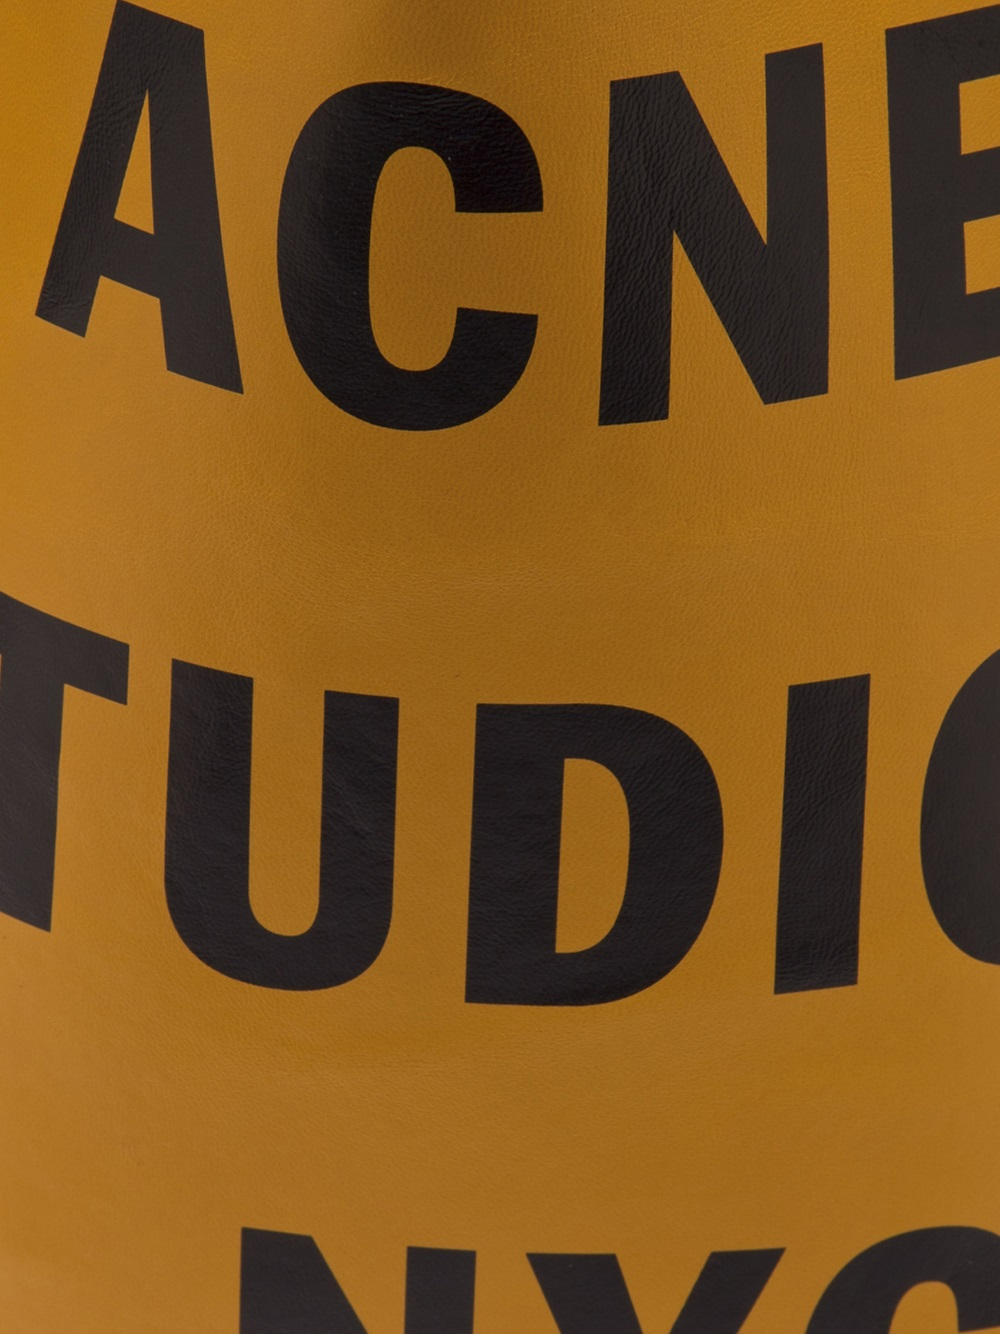 Acne Studios Rumor Us Tote in Yellow & Orange (Metallic)